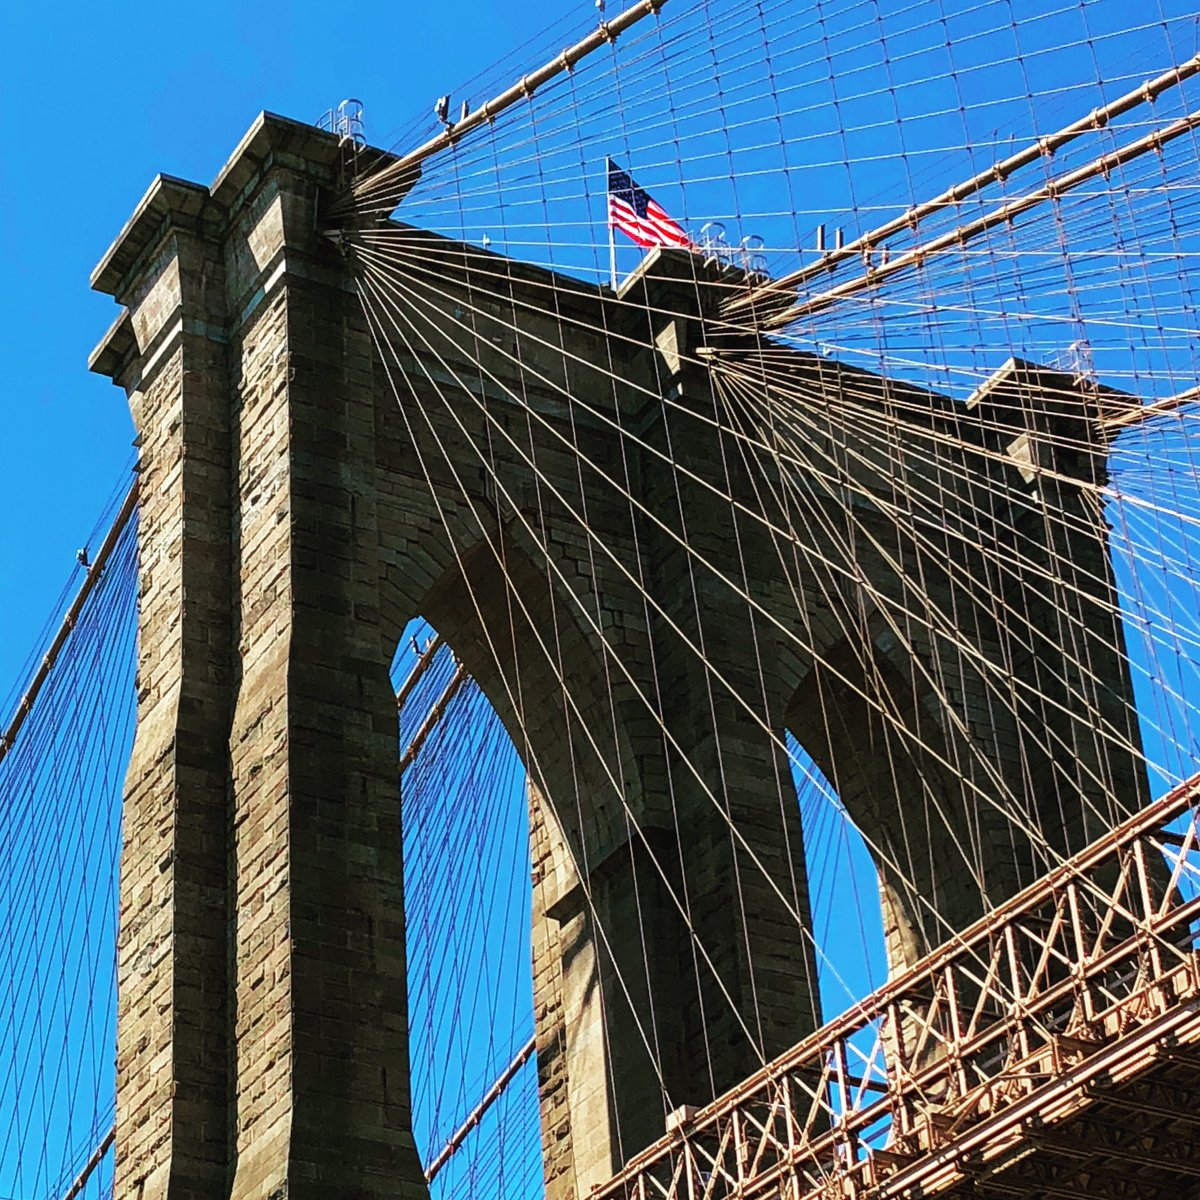 The Brooklyn Bridge Instagram: instagram.com/michi_kakutani/